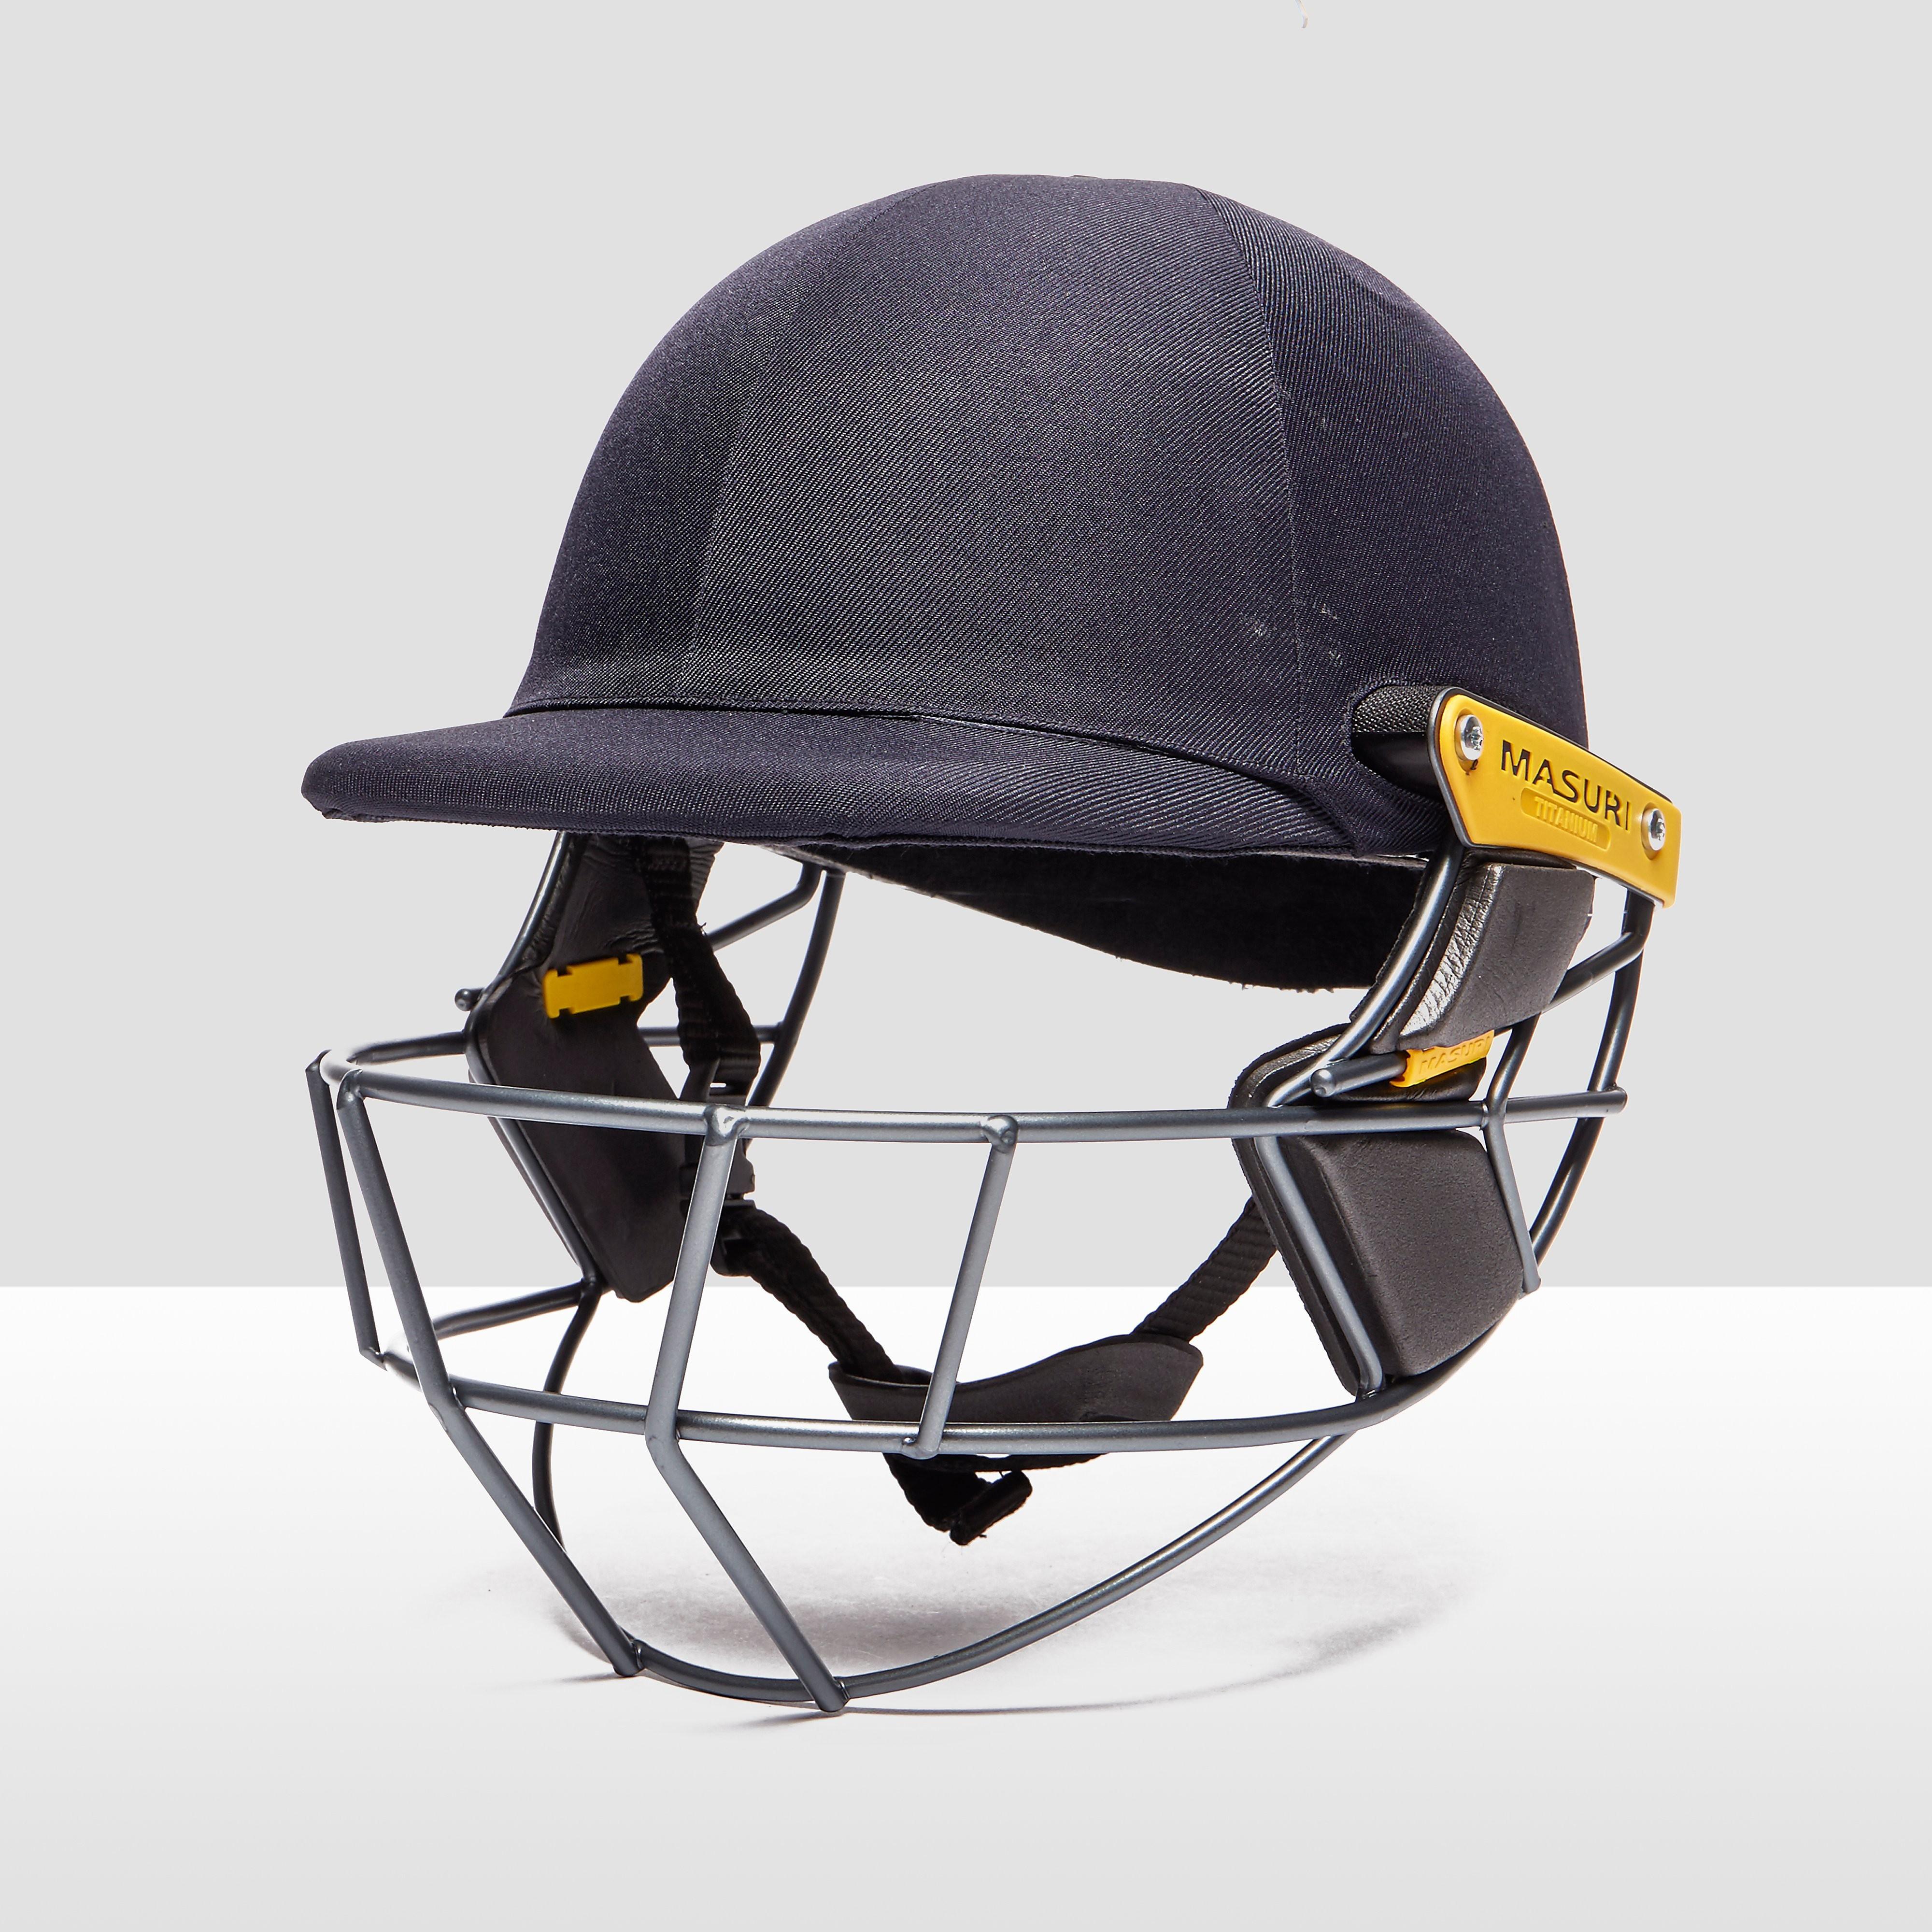 Masuri Original Series Mk2 Test Helmet - Blue, Blue